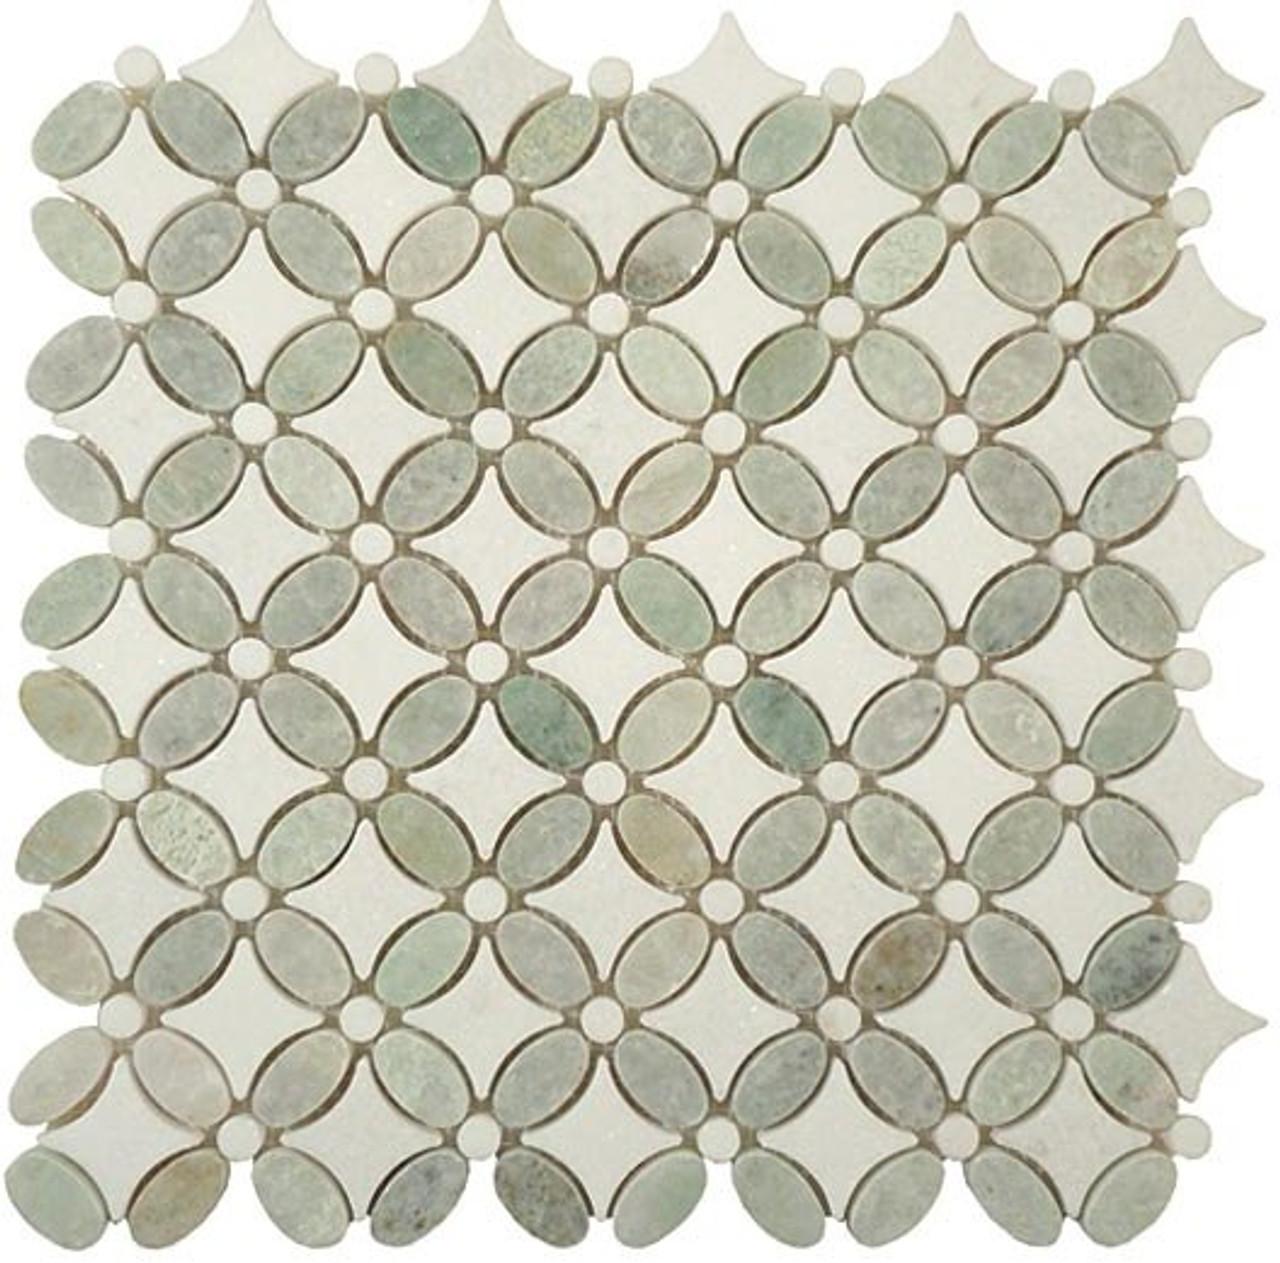 Bella Glass Tiles Flower Series FS-74 marble mosaic tile